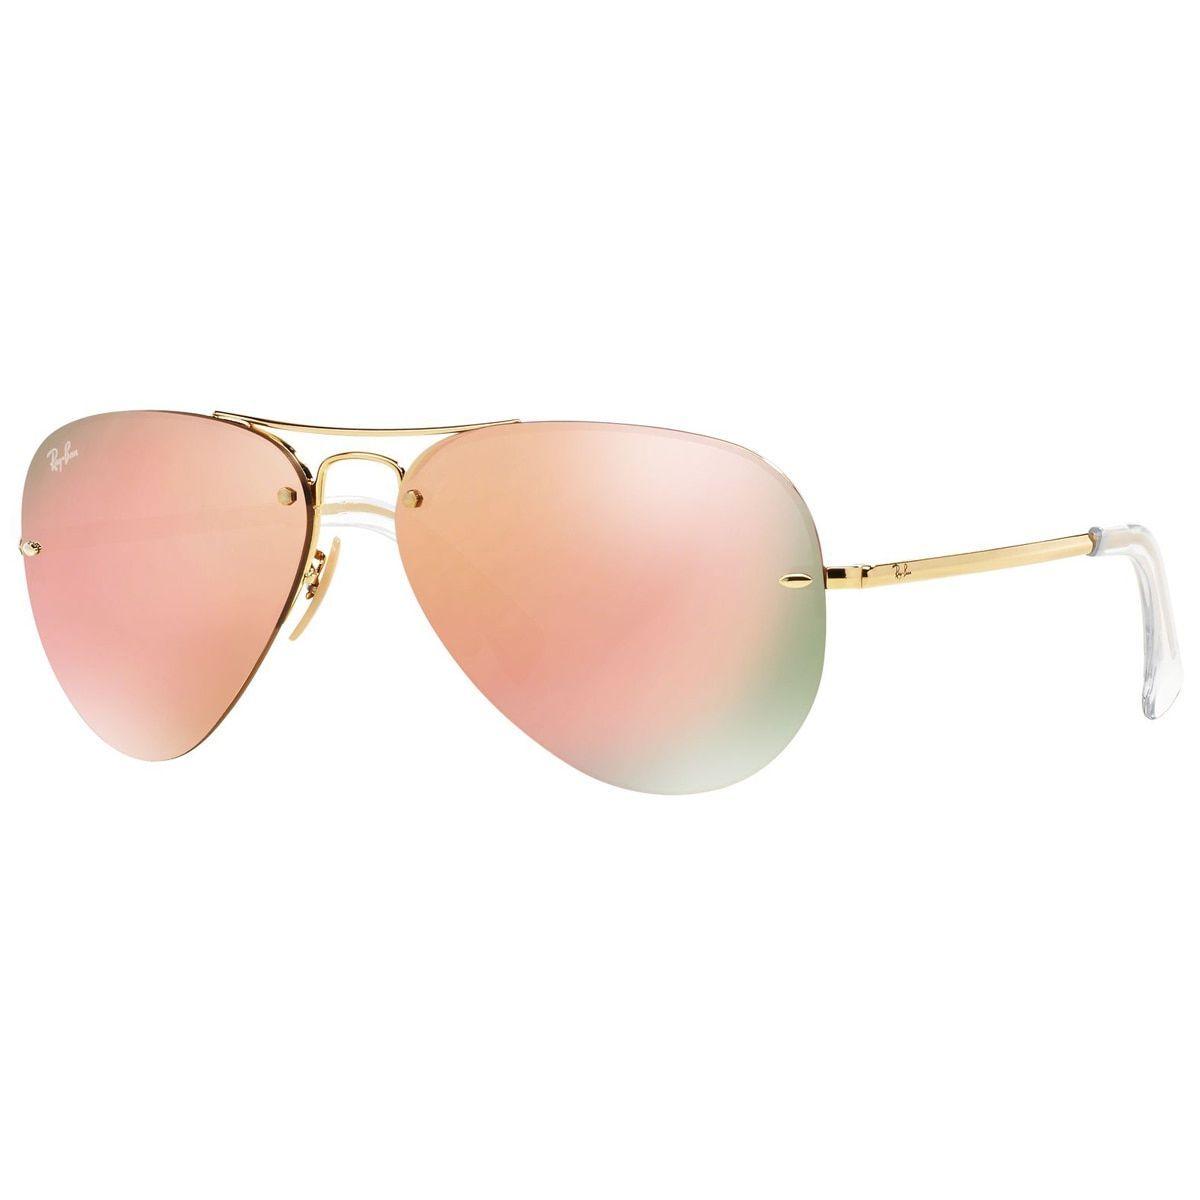 86002cc38a Ray-Ban RB3449 001 2Y Unisex Gold Frame Copper Mirror Lens Sunglasses ( RB3449 001 2Y 59)